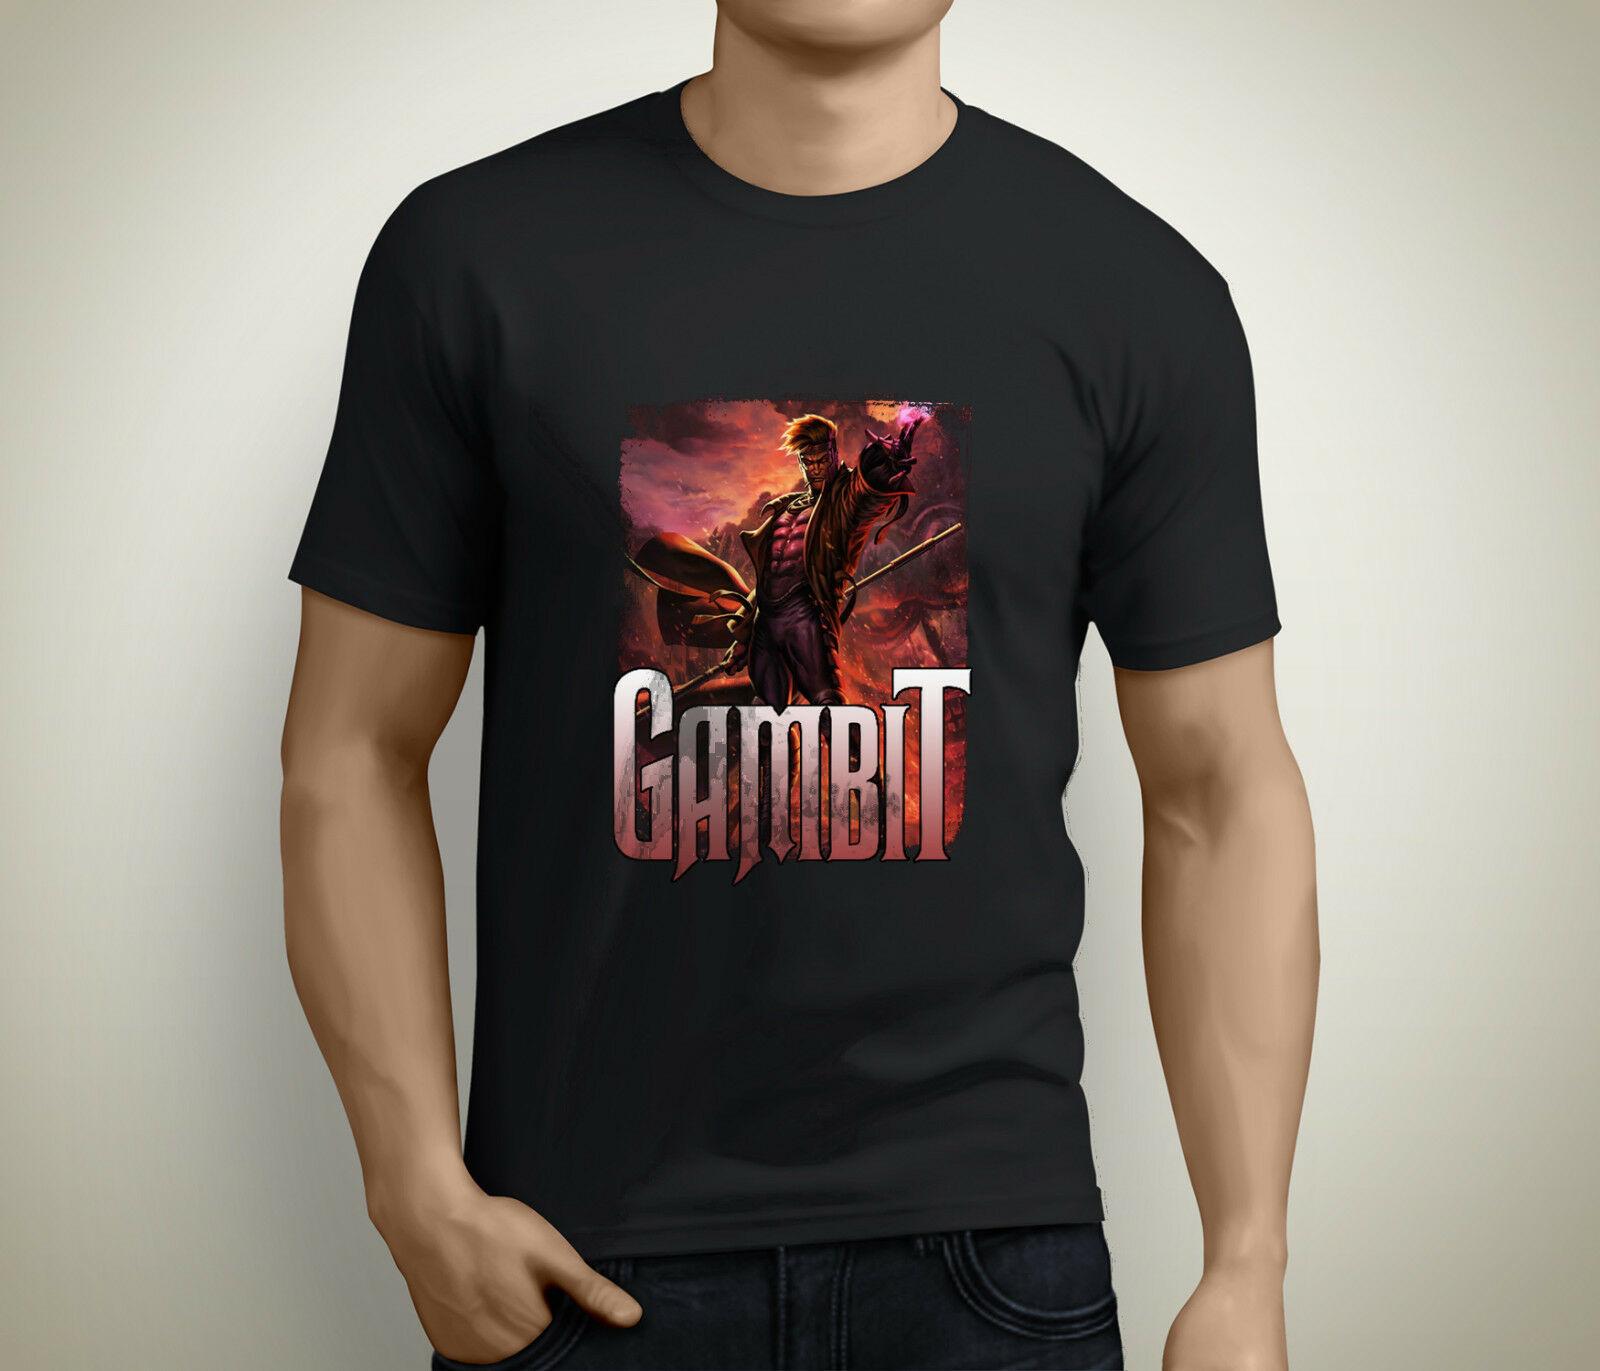 Nuevo GAMBIT X-hombres de manga corta negro camiseta tamaño S a 5XL 100% de algodón de manga corta cuello redondo tops Tee camisetas